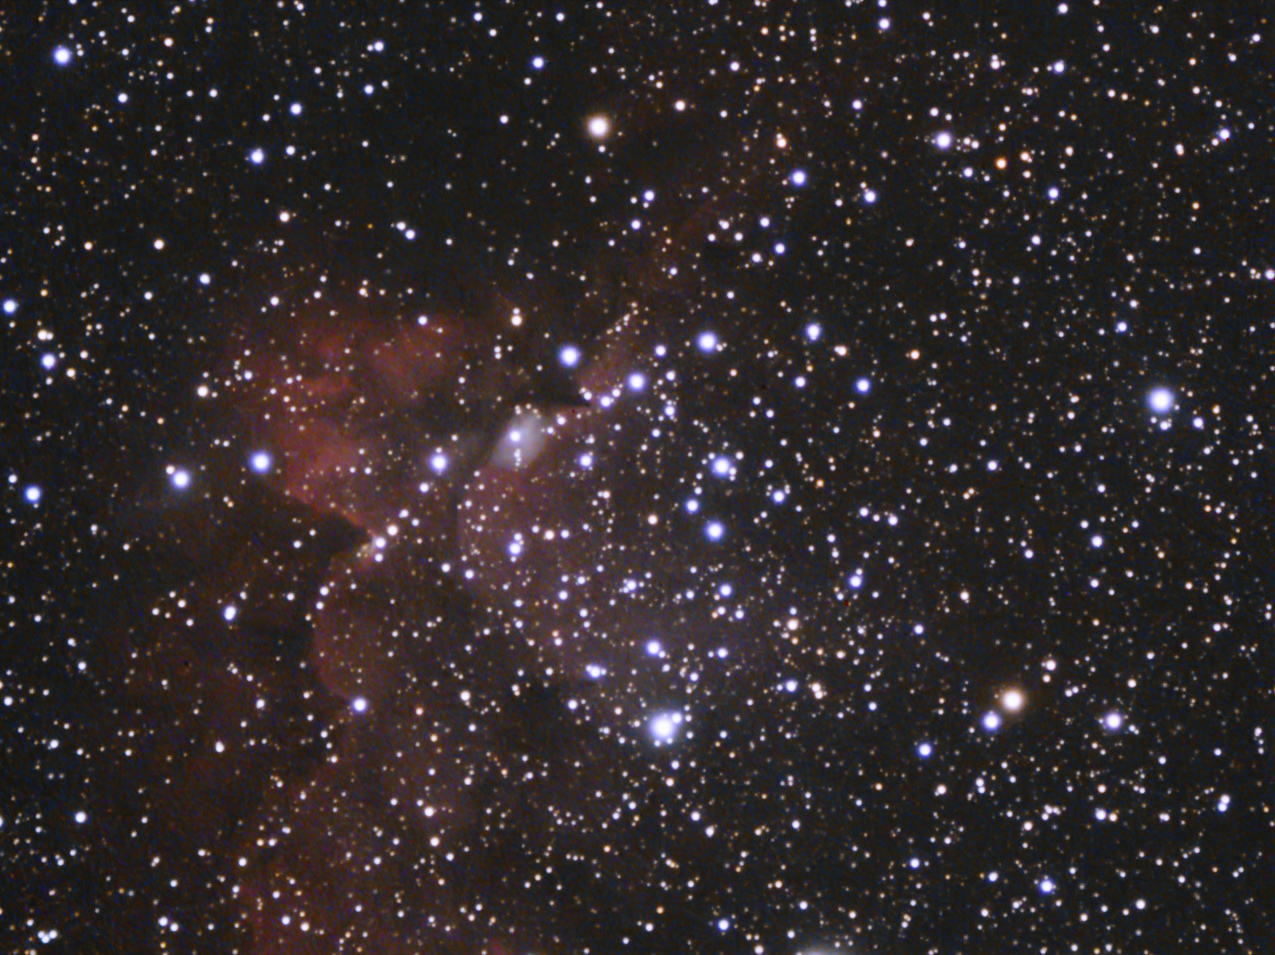 NGC7380_LS_09072019_r1.1.jpg.27e296c59622cd9d48a9caa0e2ccc3e0.jpg